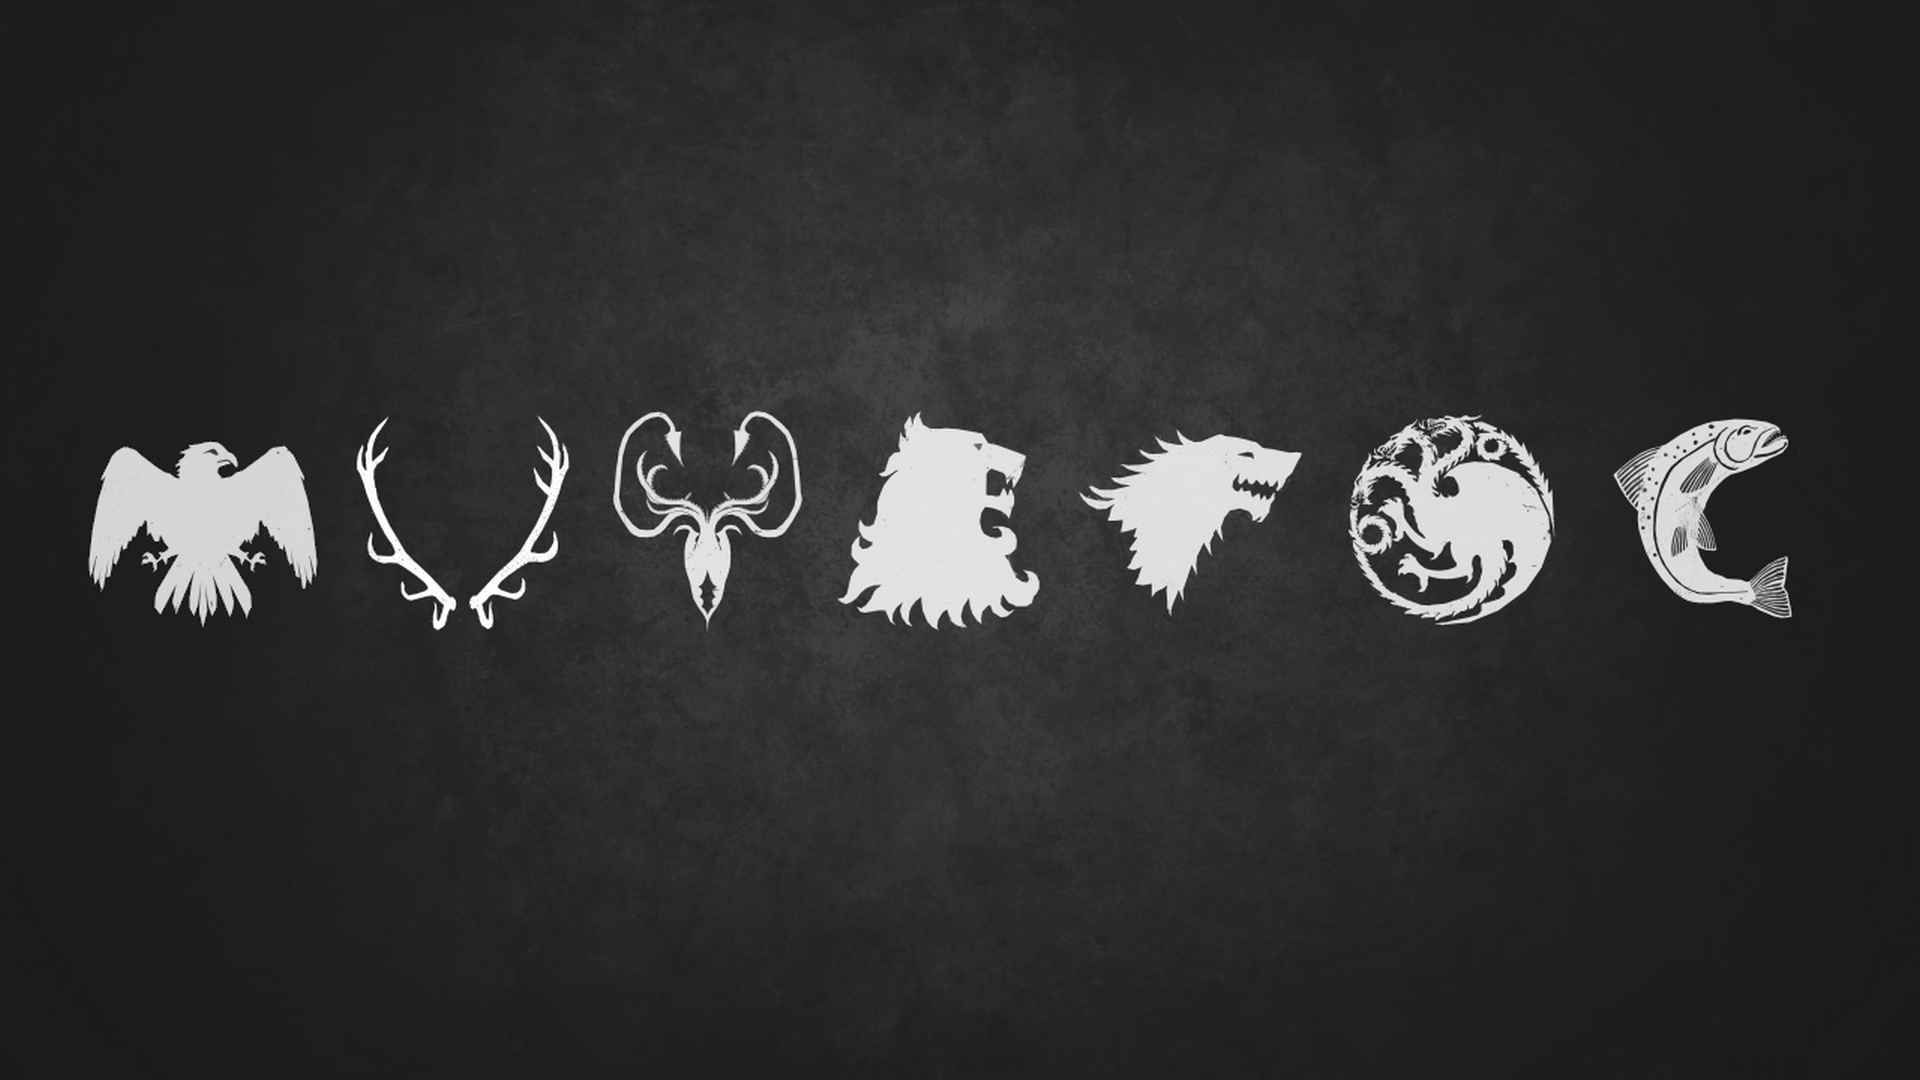 Game Of Thrones Kingdoms Logo Wallaper 726 Wallpaper Hd Dowload